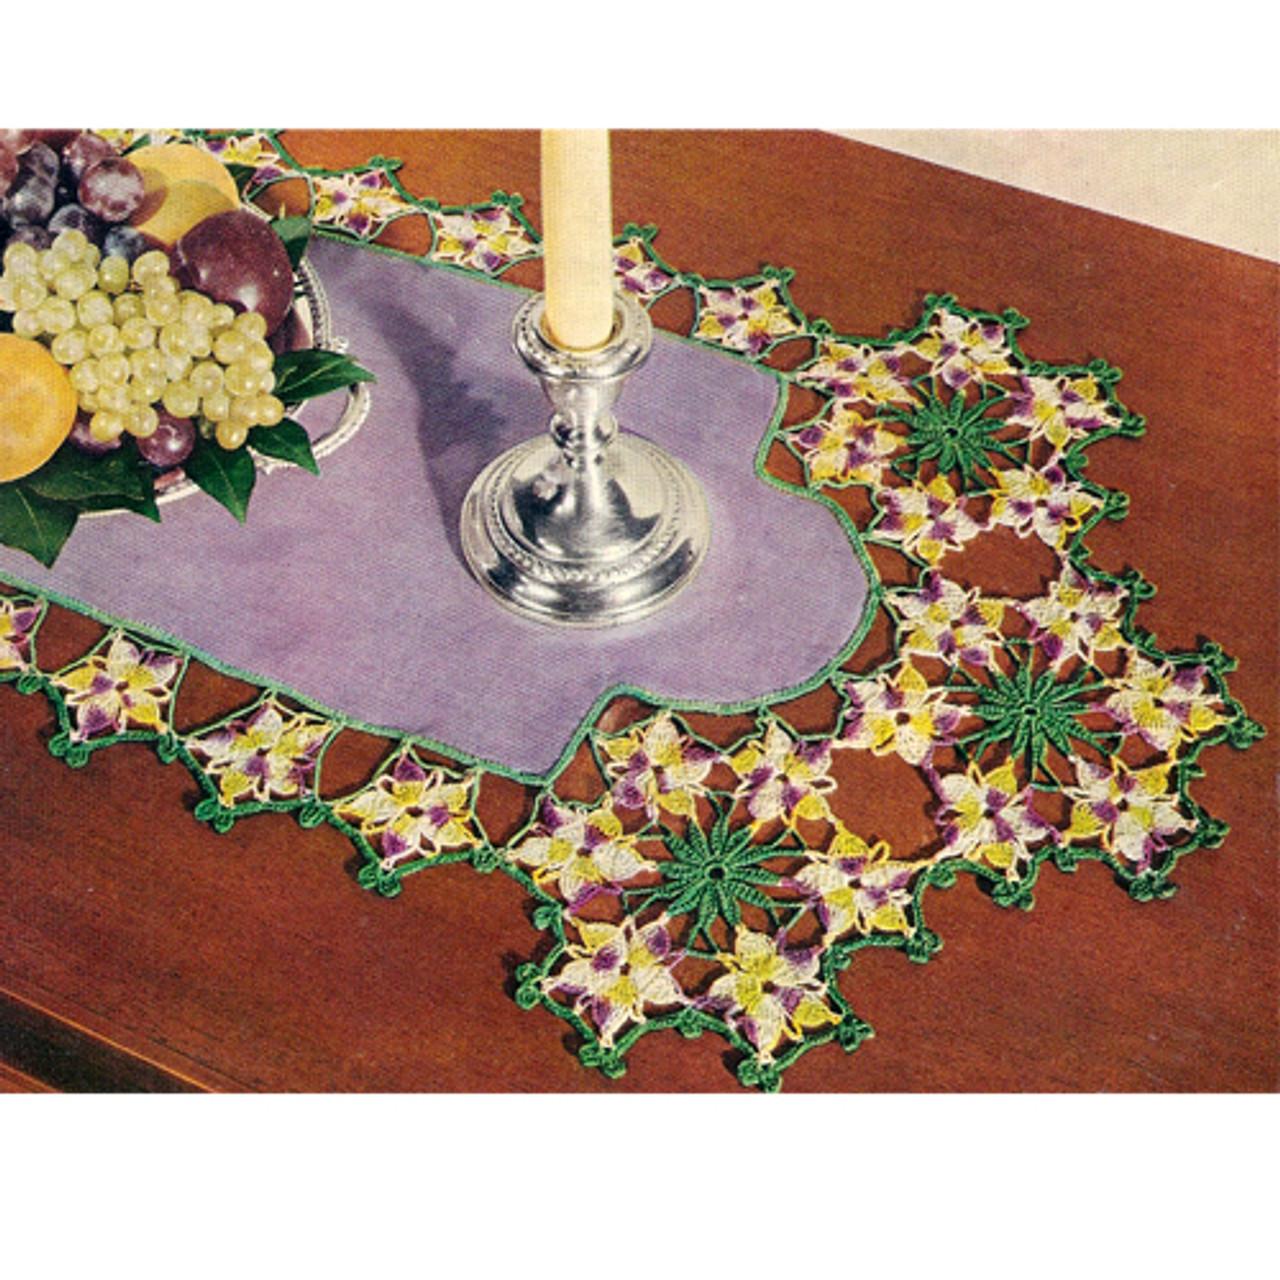 Crochet Violet Edging Scarf Pattern on Linen